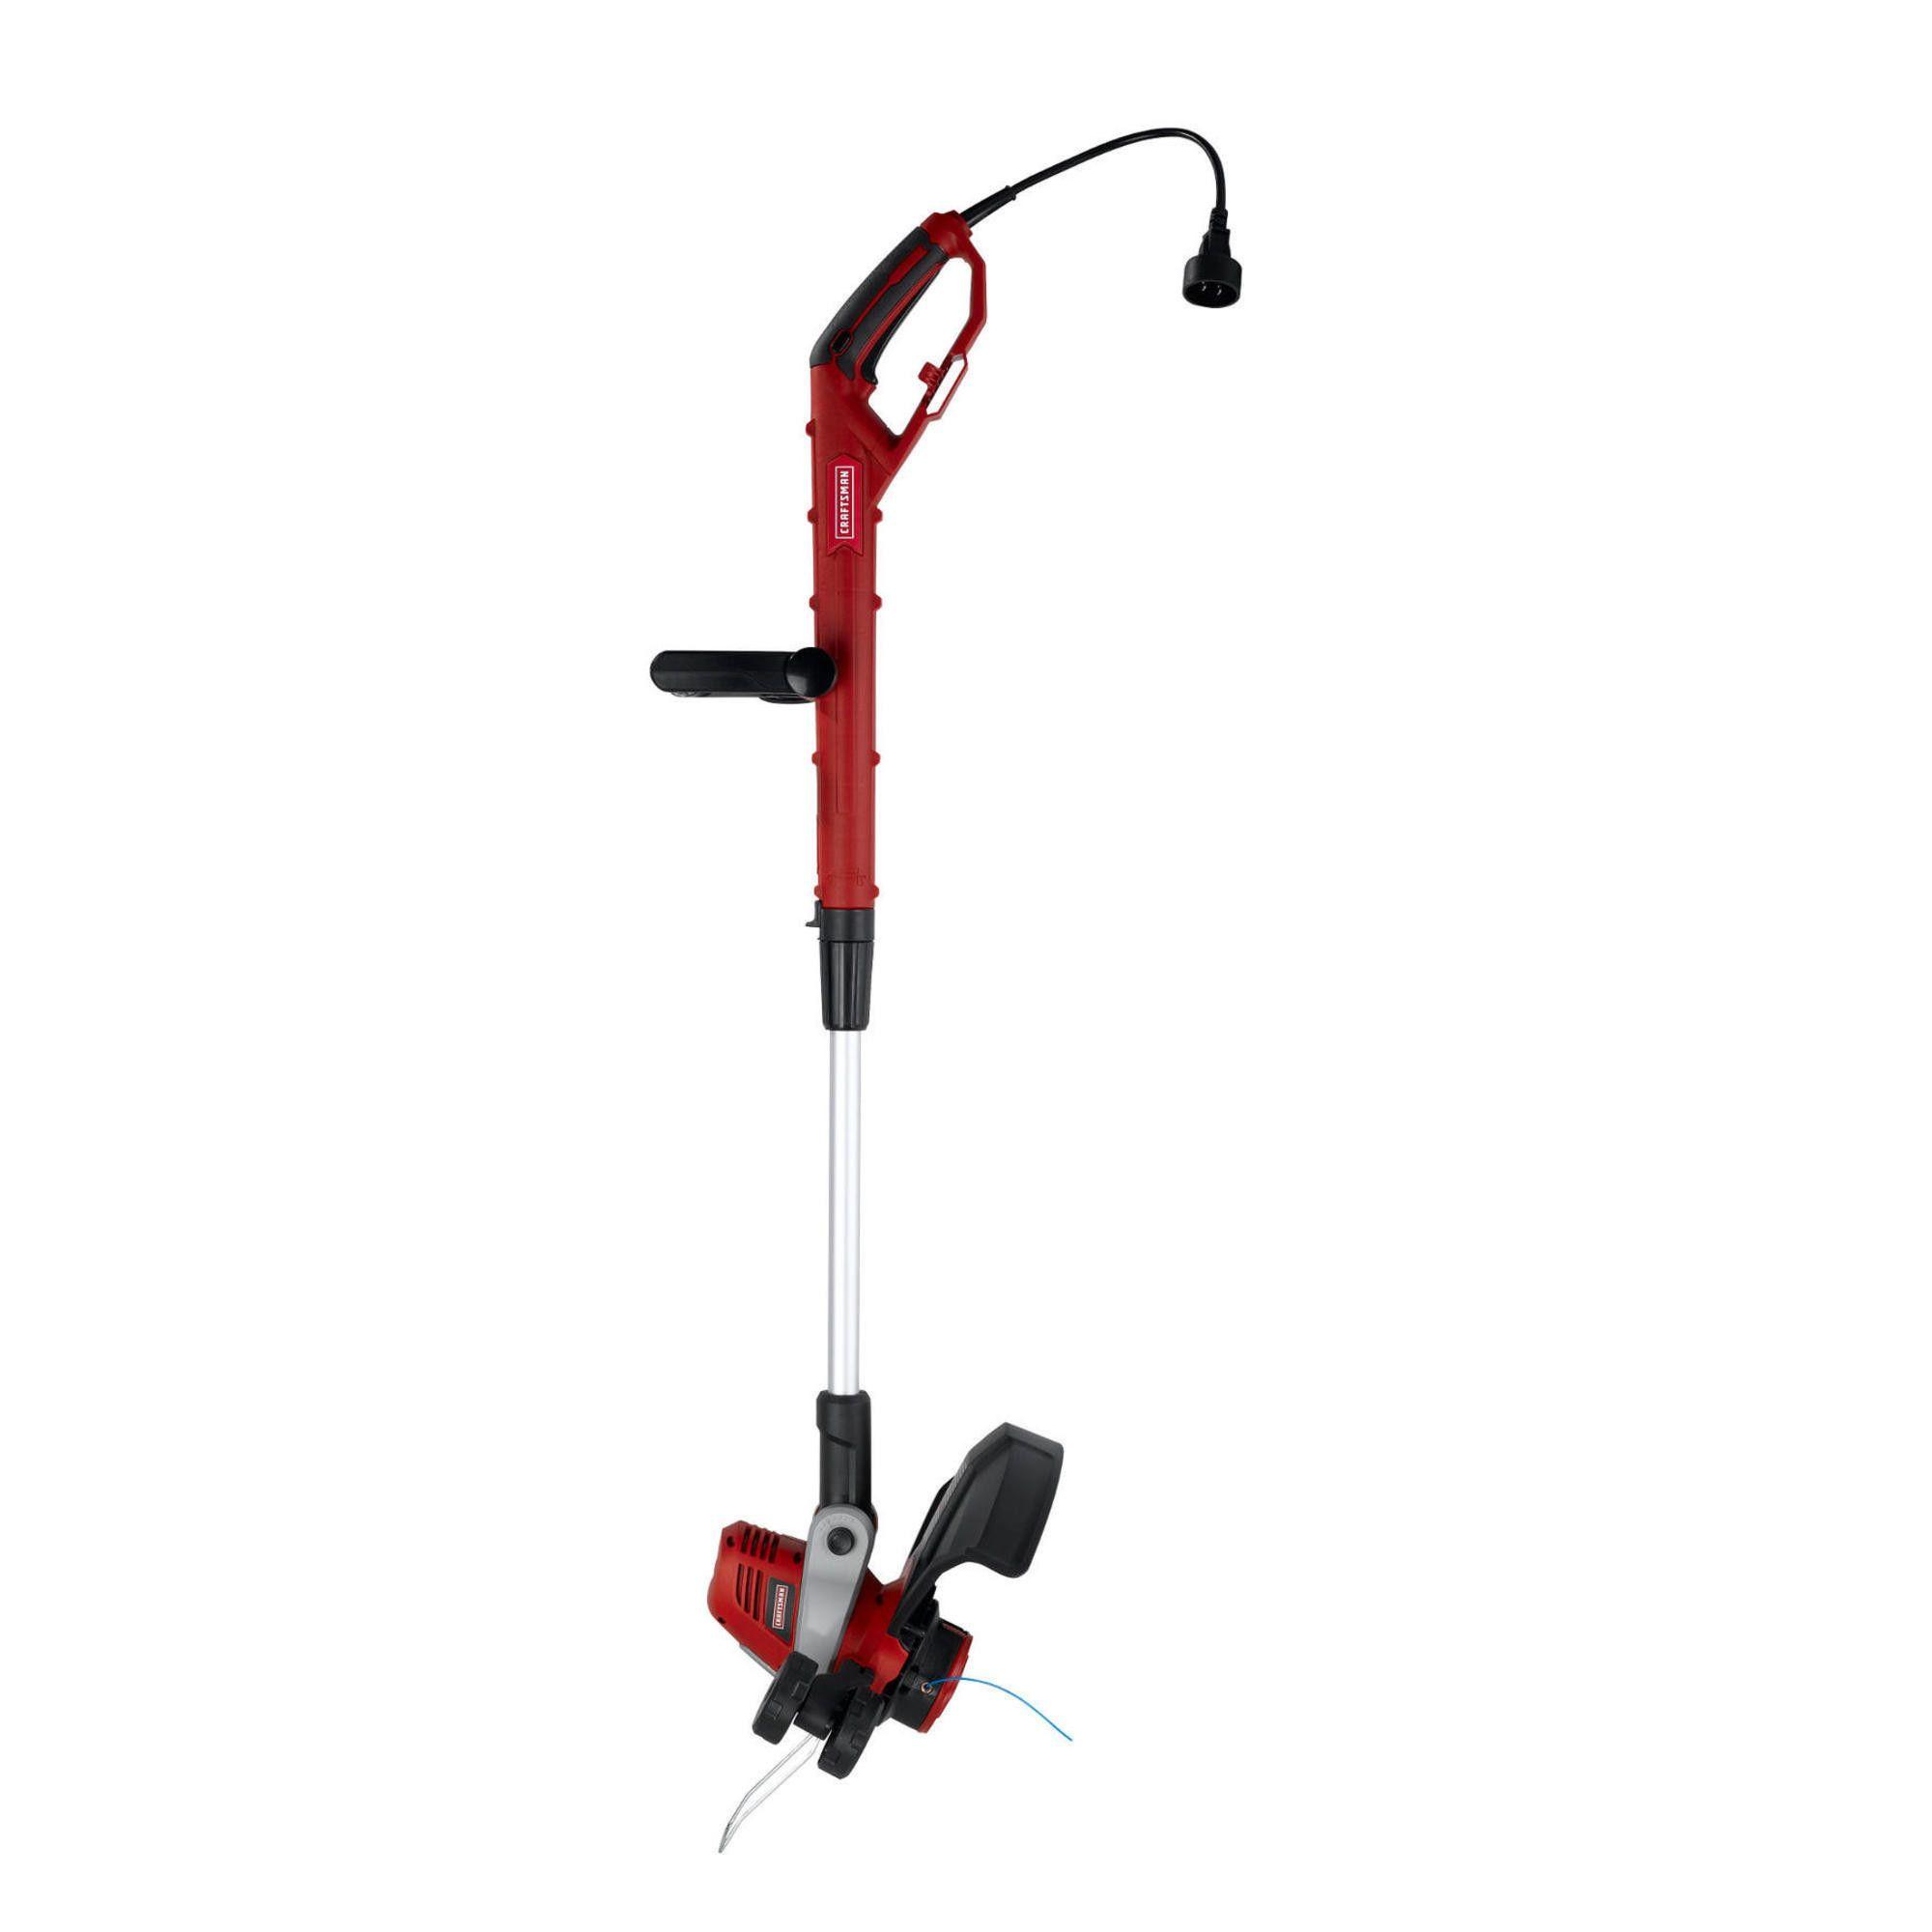 Craftsman 30383 15 Electric Corded Line Trimmer Grass Cutter Grass Weeds Craftsman